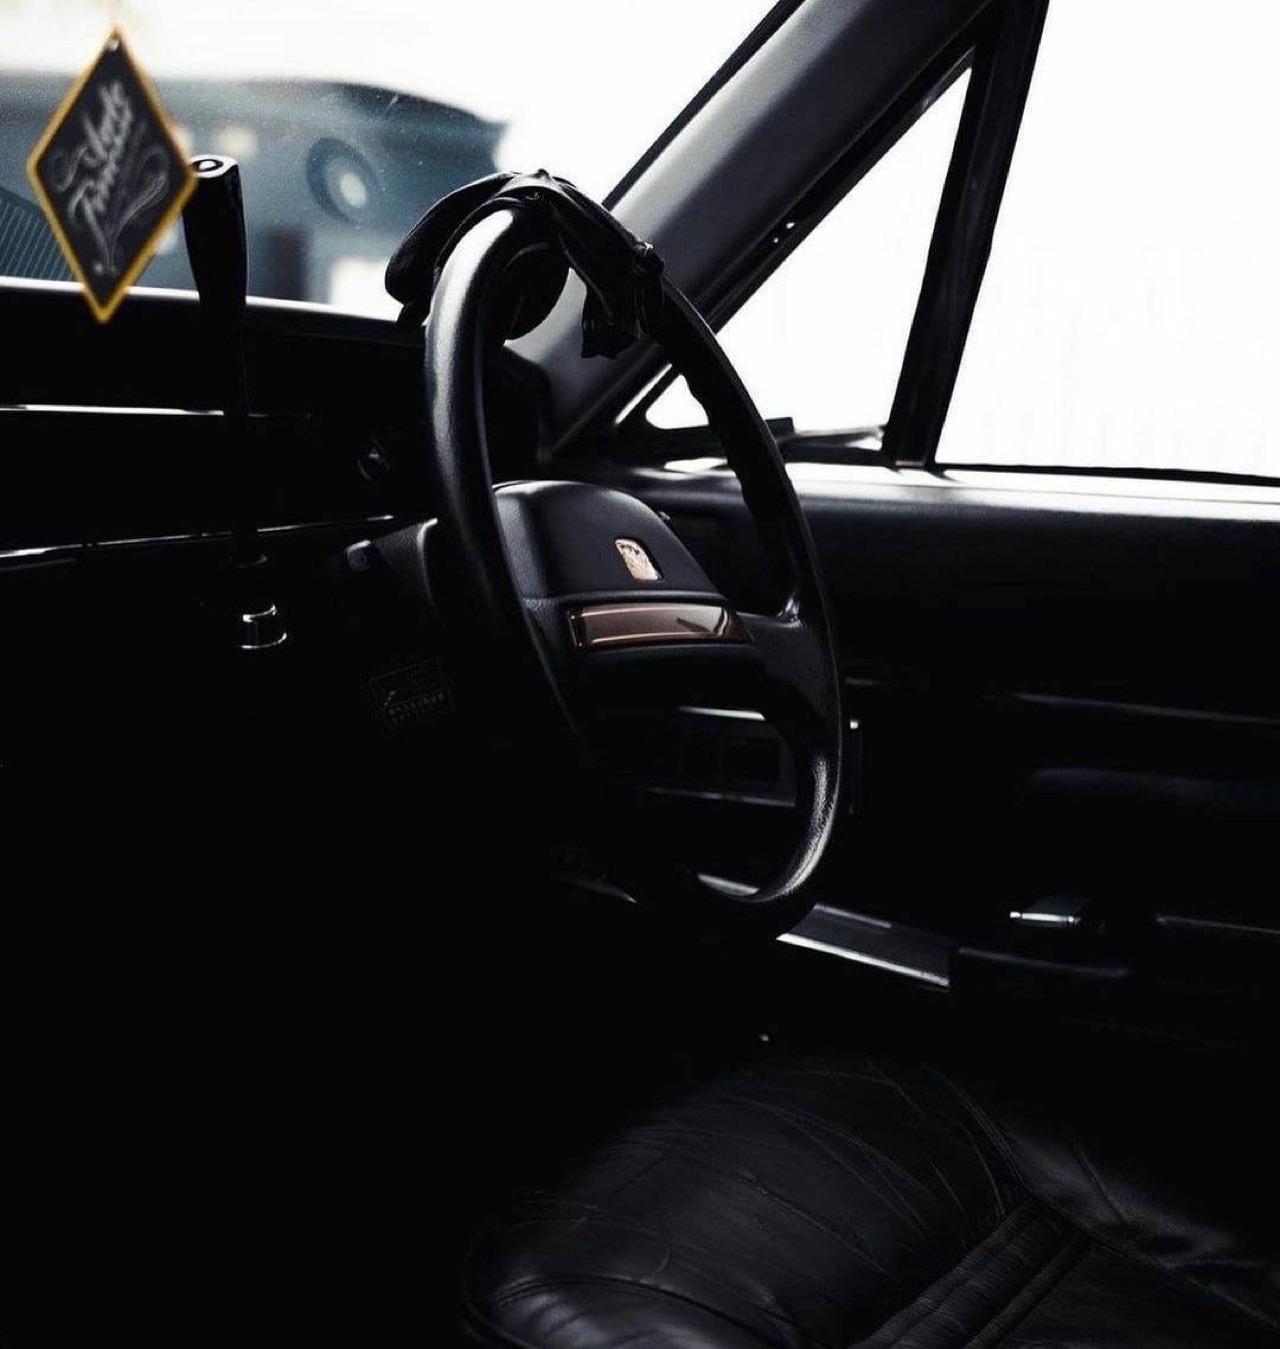 Bagged Toyota Century II V12 - A tes souhaits ! 26